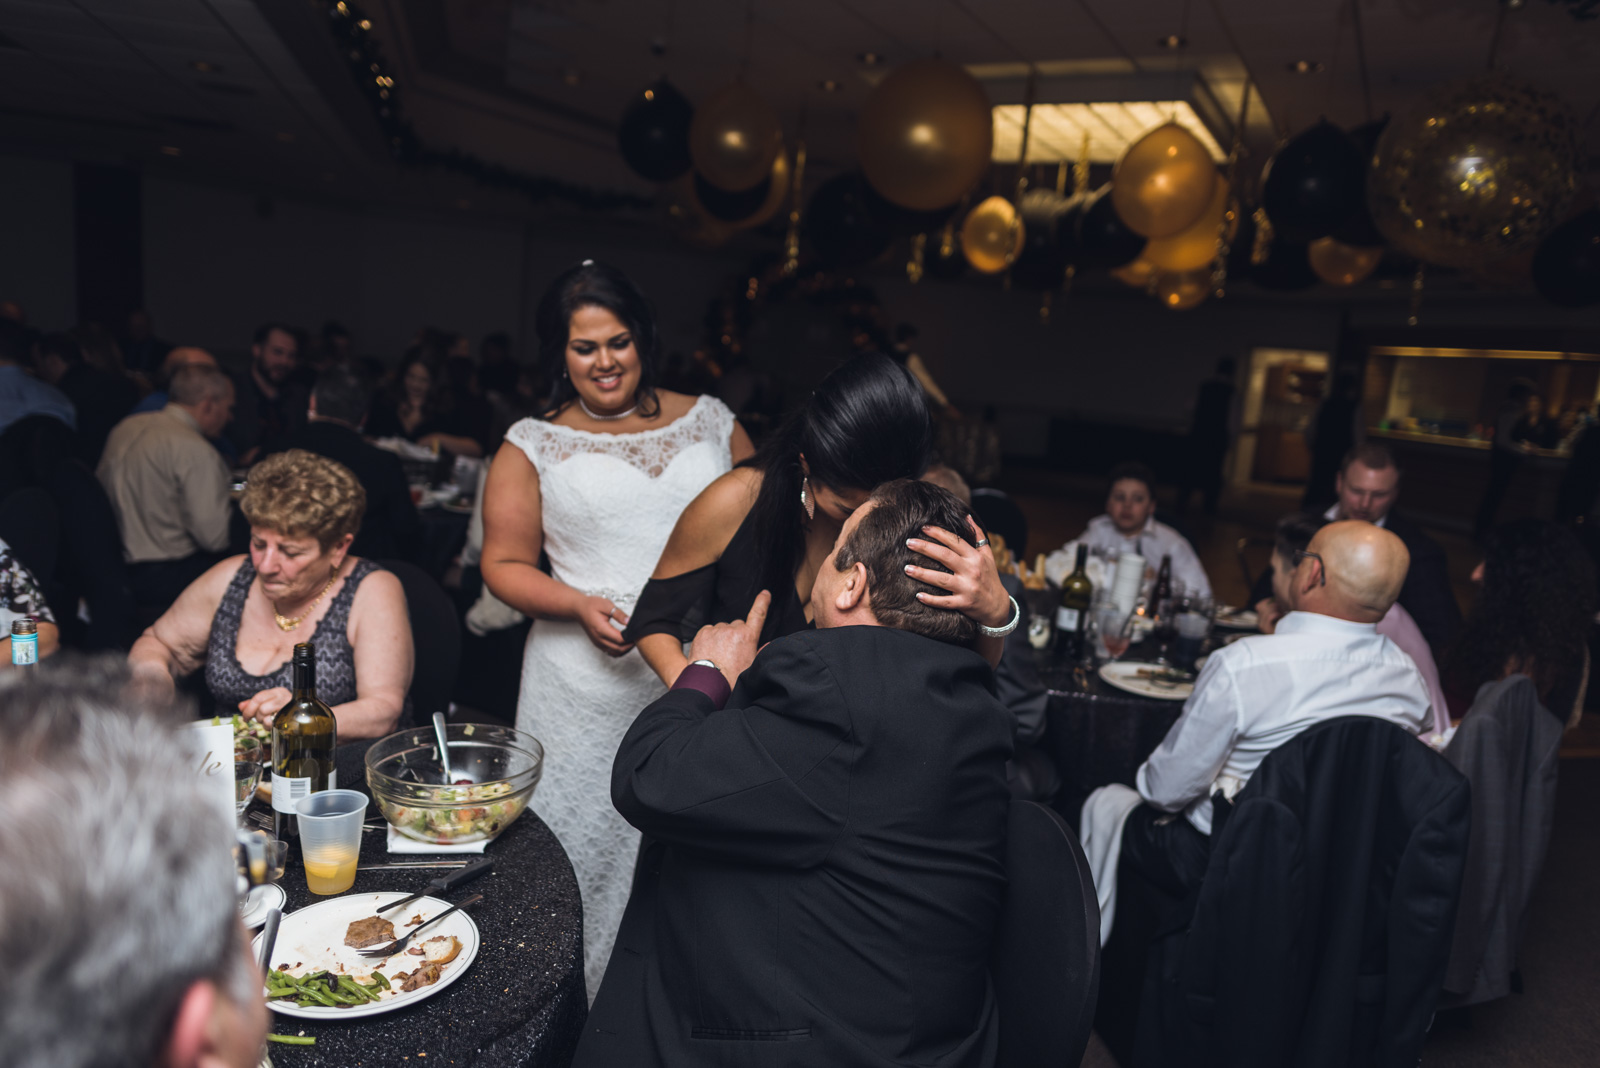 rheana-chris-wedding-blog-265.jpg